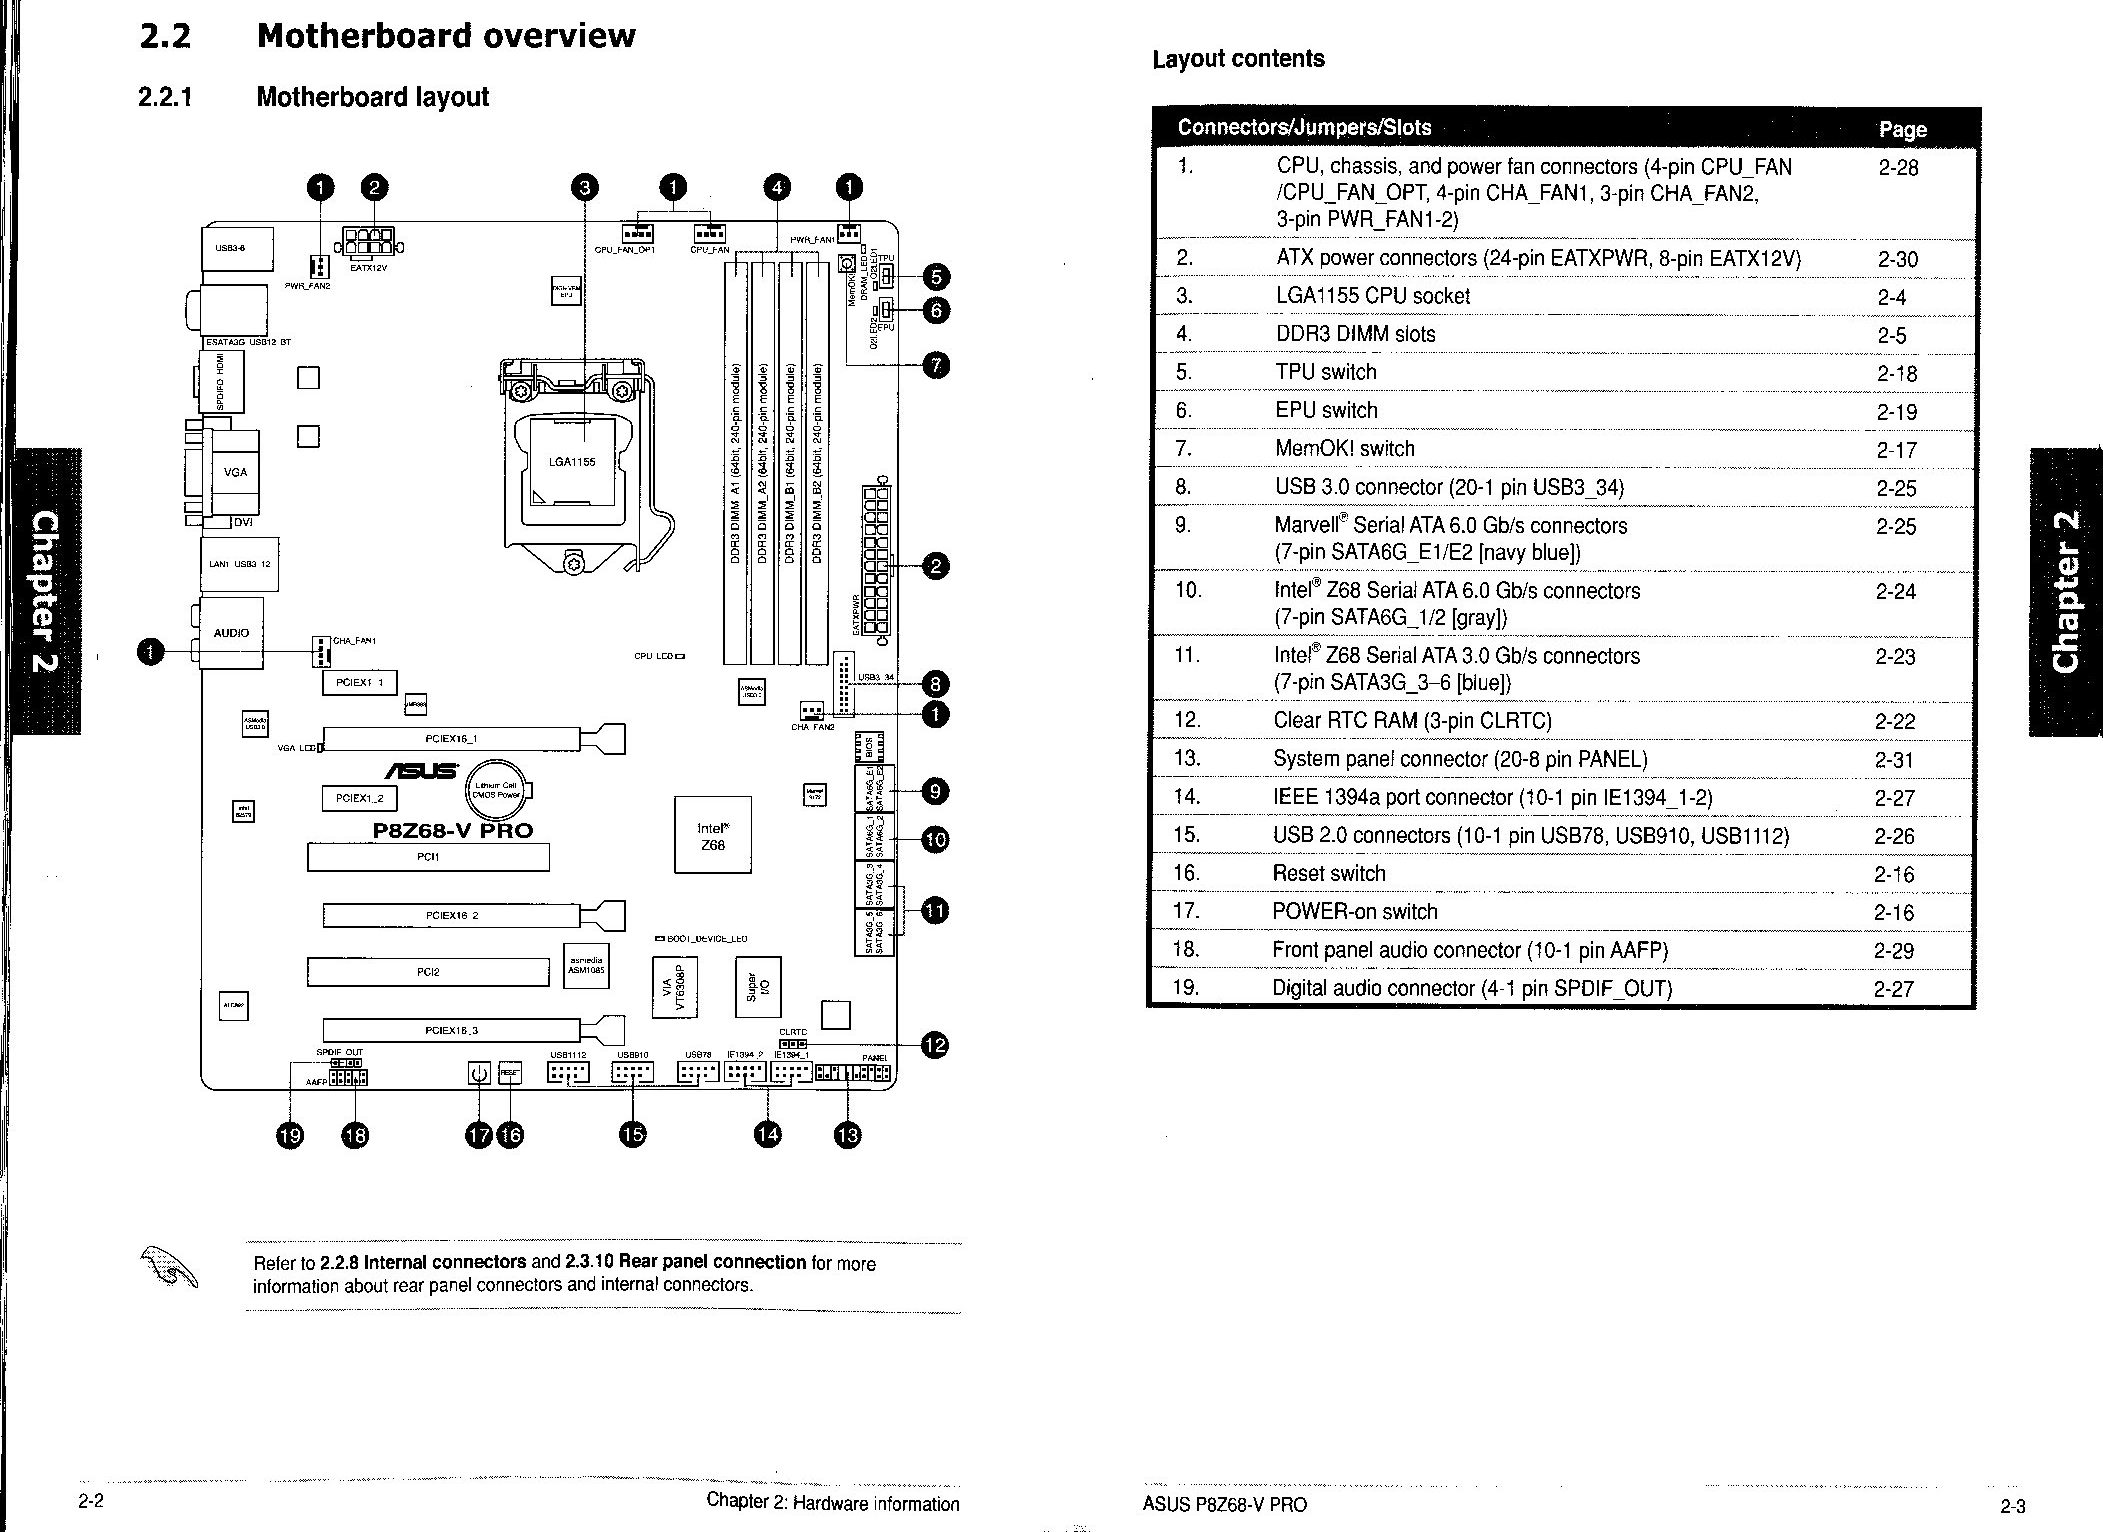 Mobo manual page 2.2